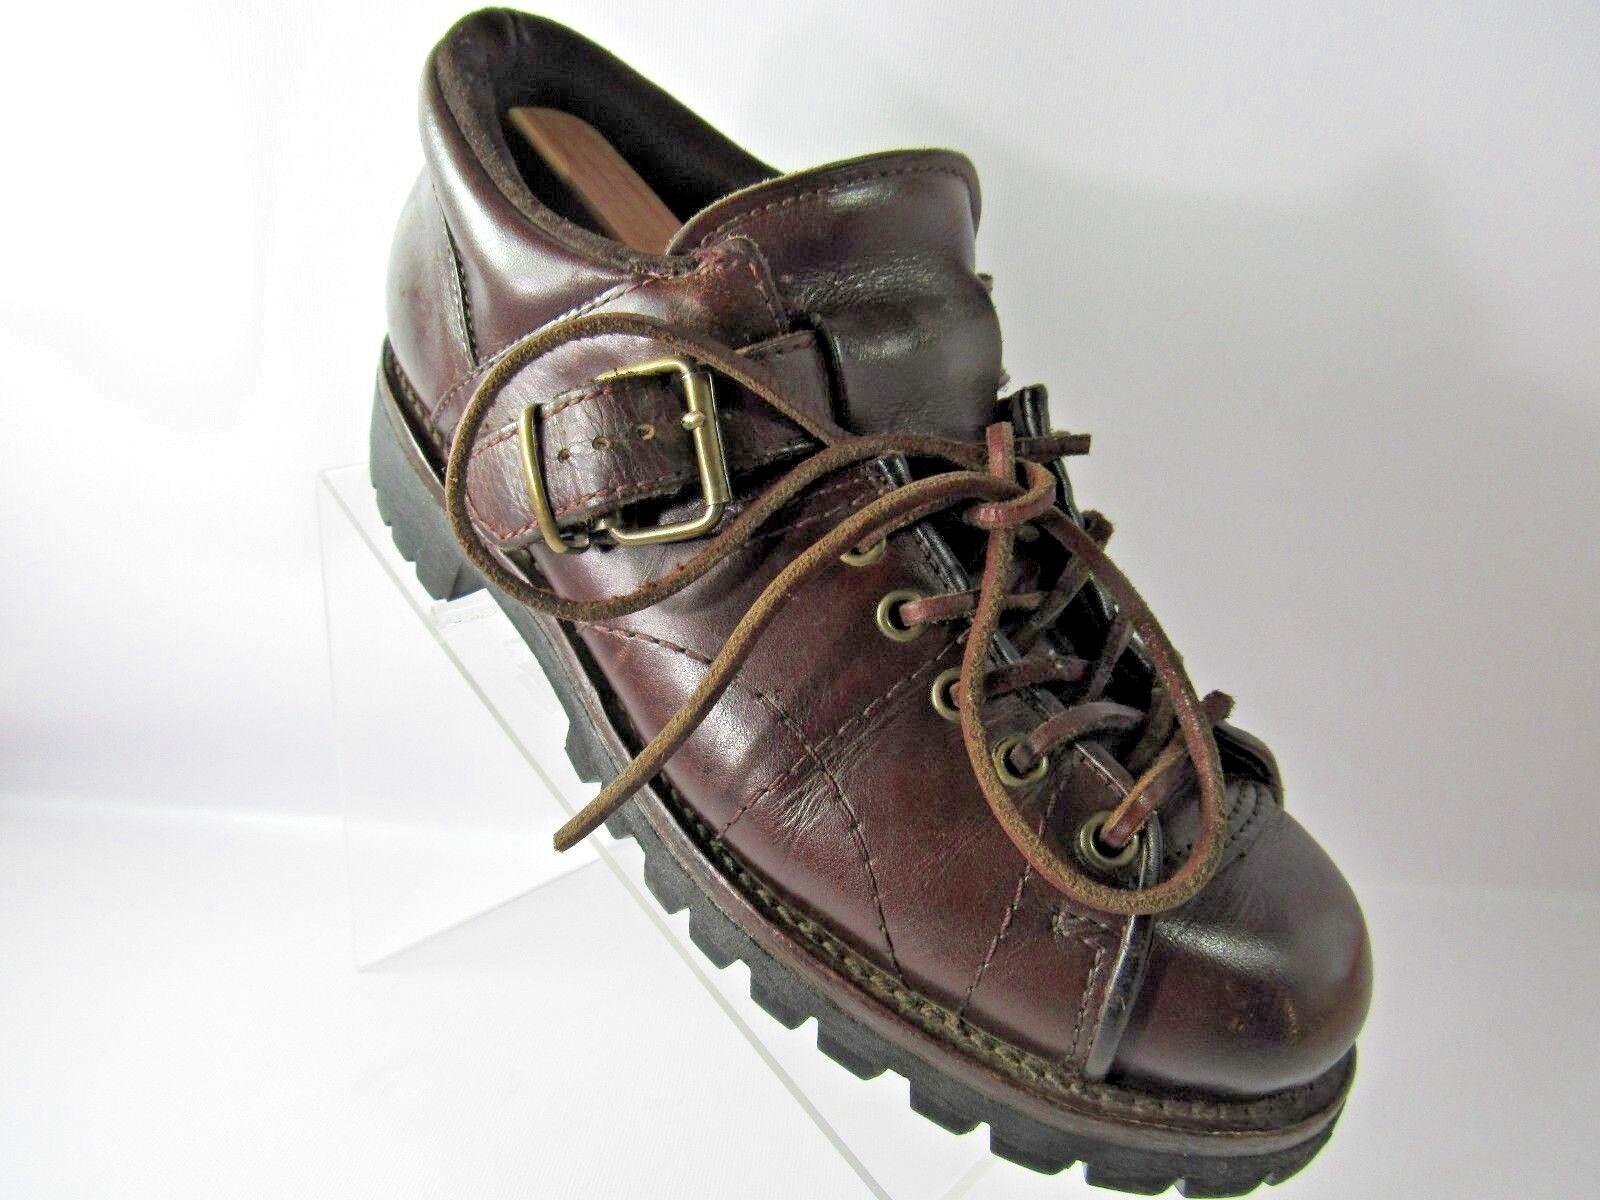 Ralph Lauren Polo Sport Größe 9.5 D D D braun Leather Hiking Ankle Stiefel Mens schuhe 6c3f1e